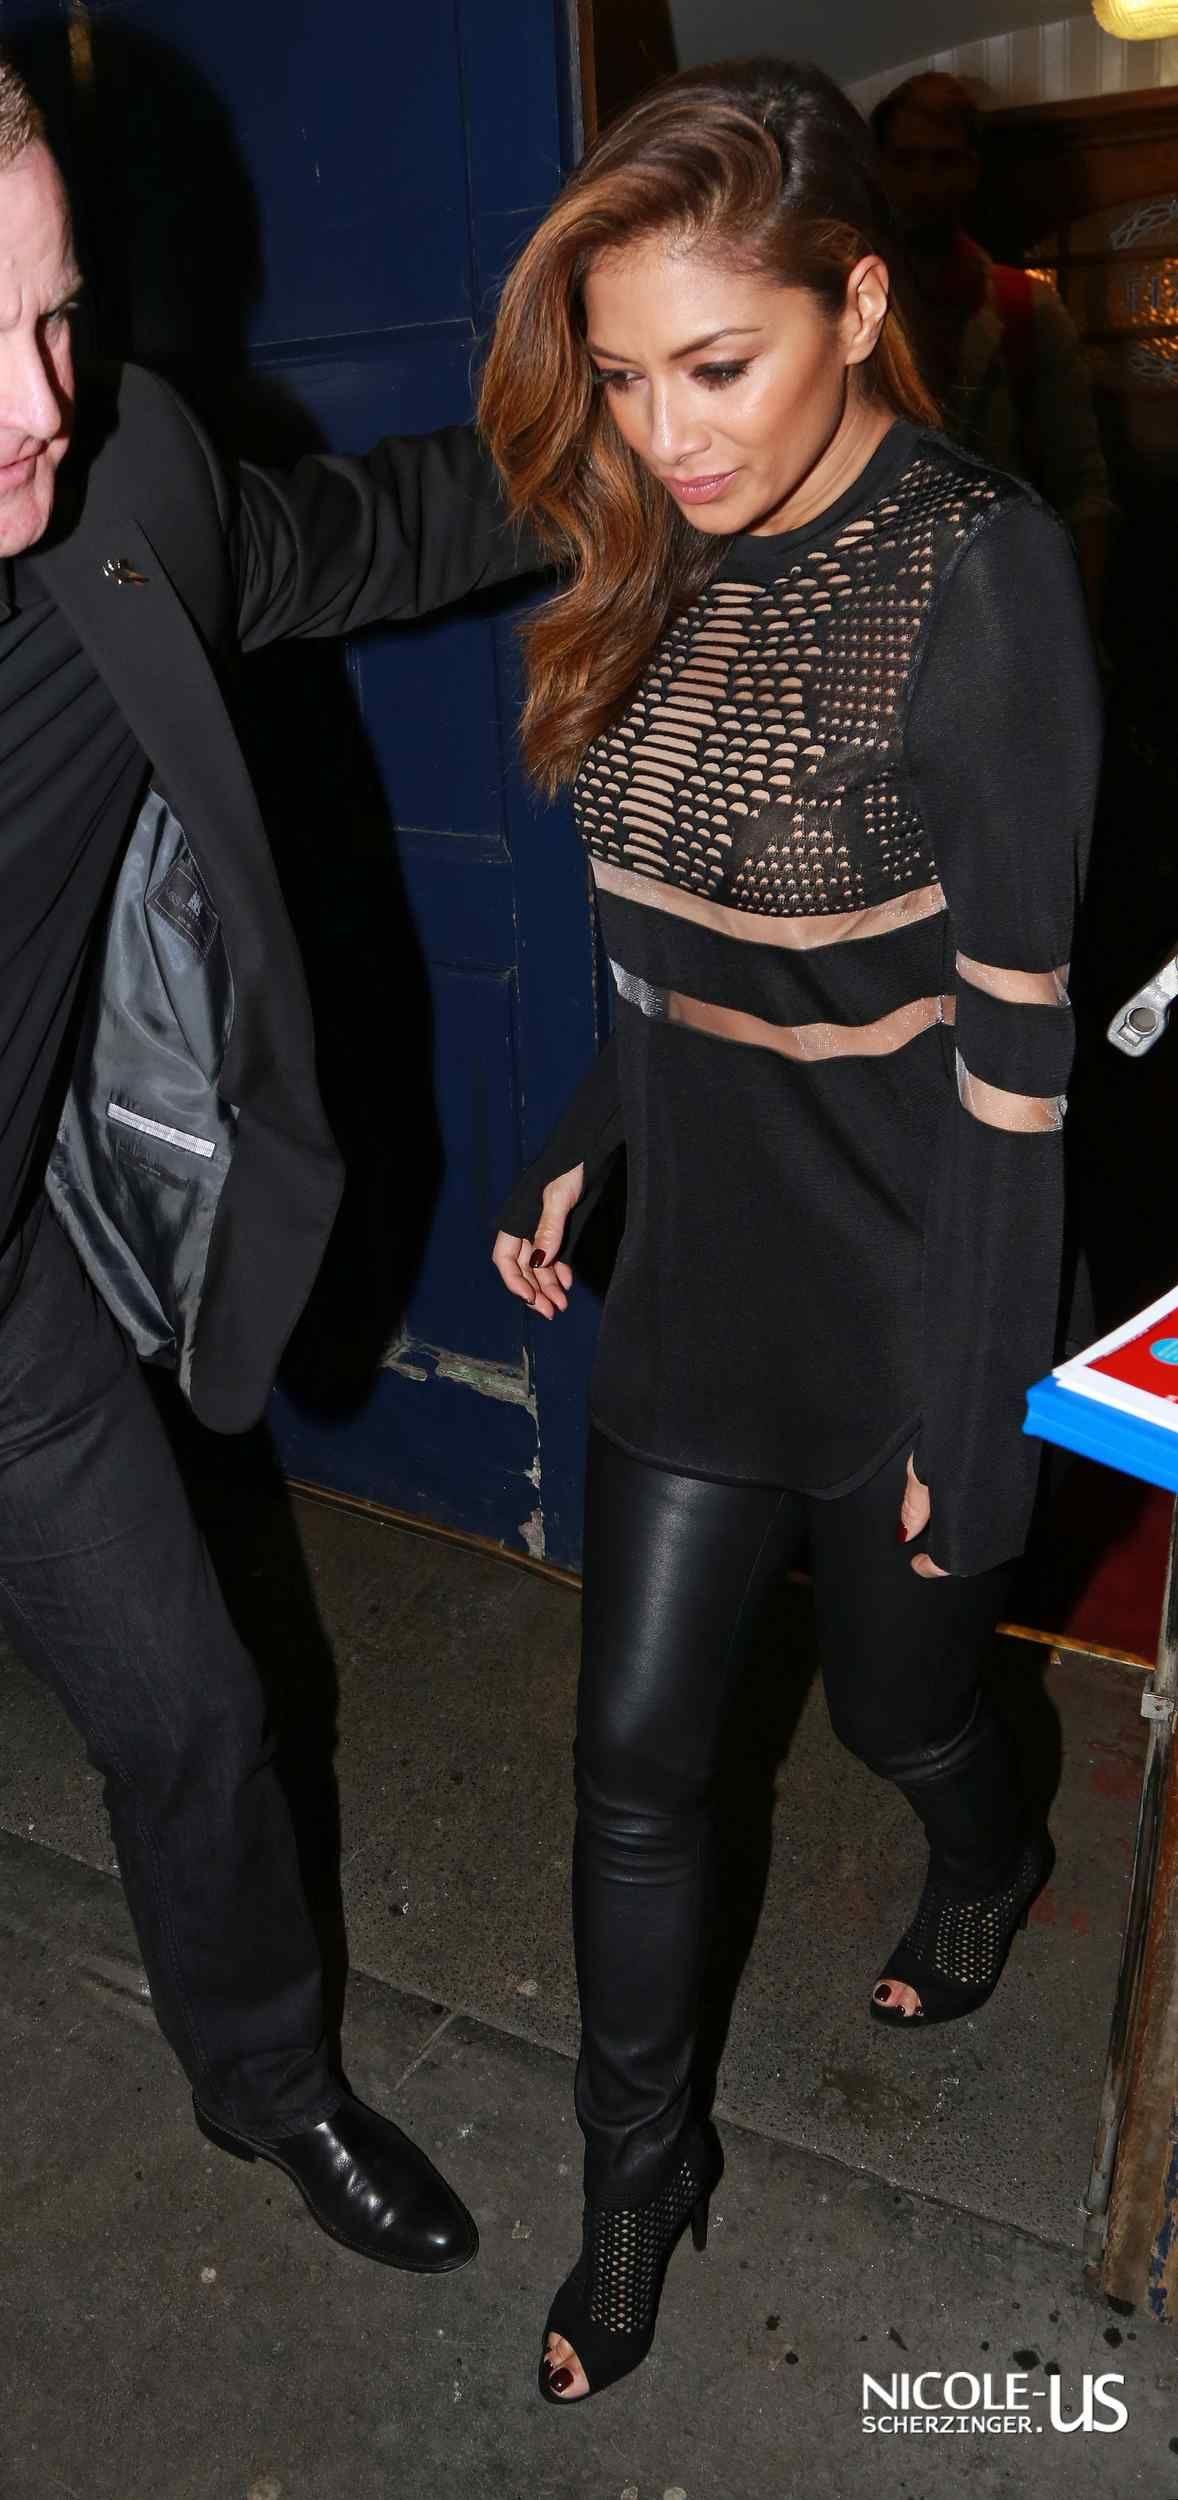 Nicole Scherzinger leaving Cats the musical